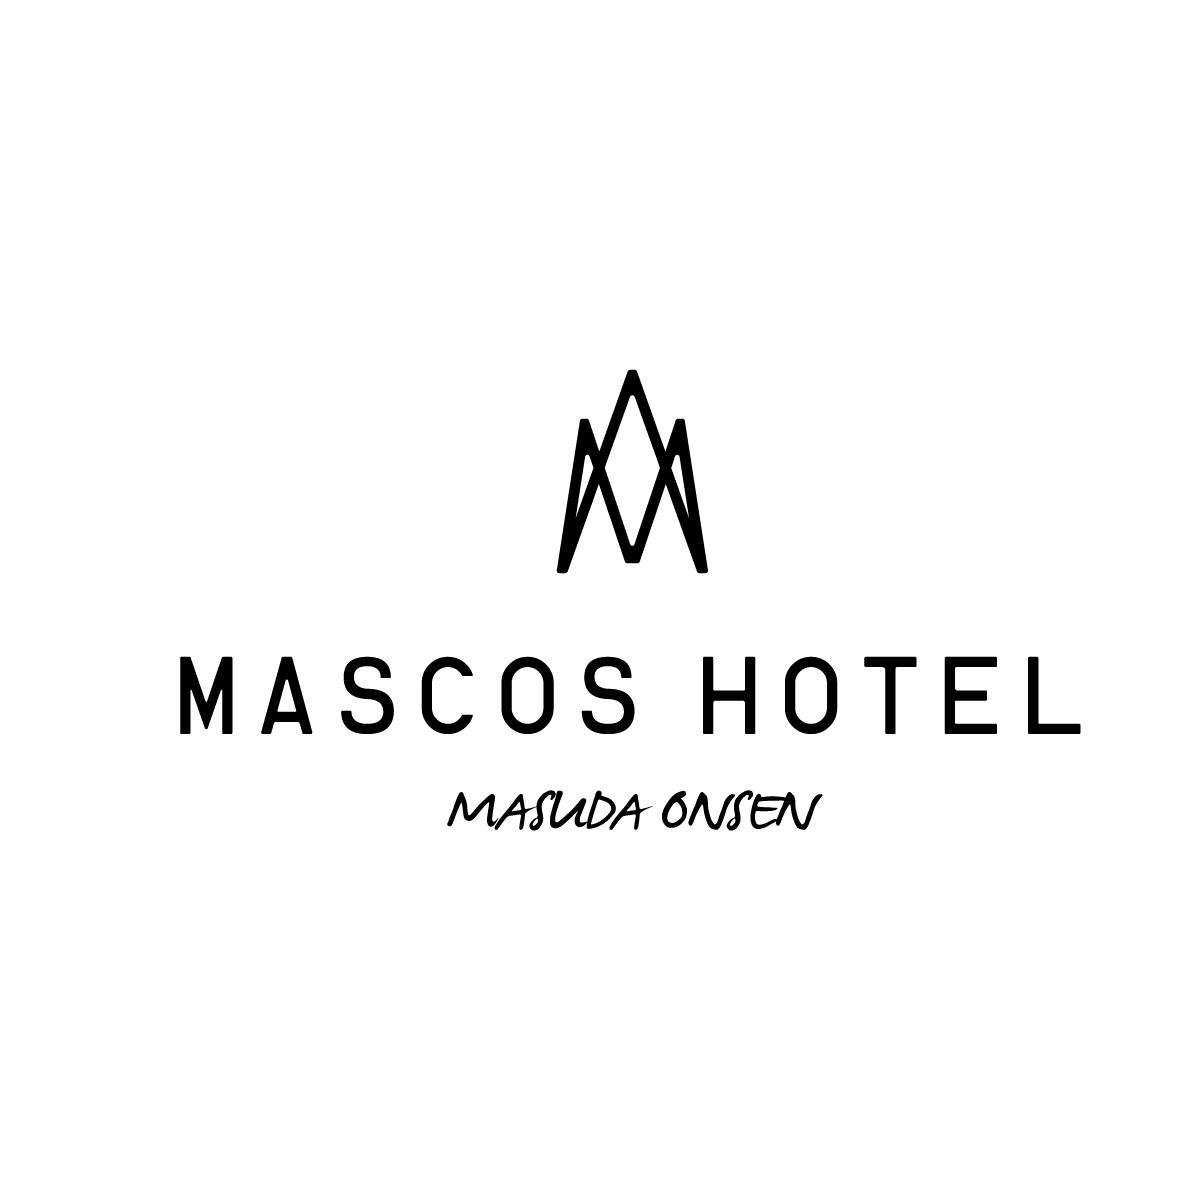 MASCOS HOTEL